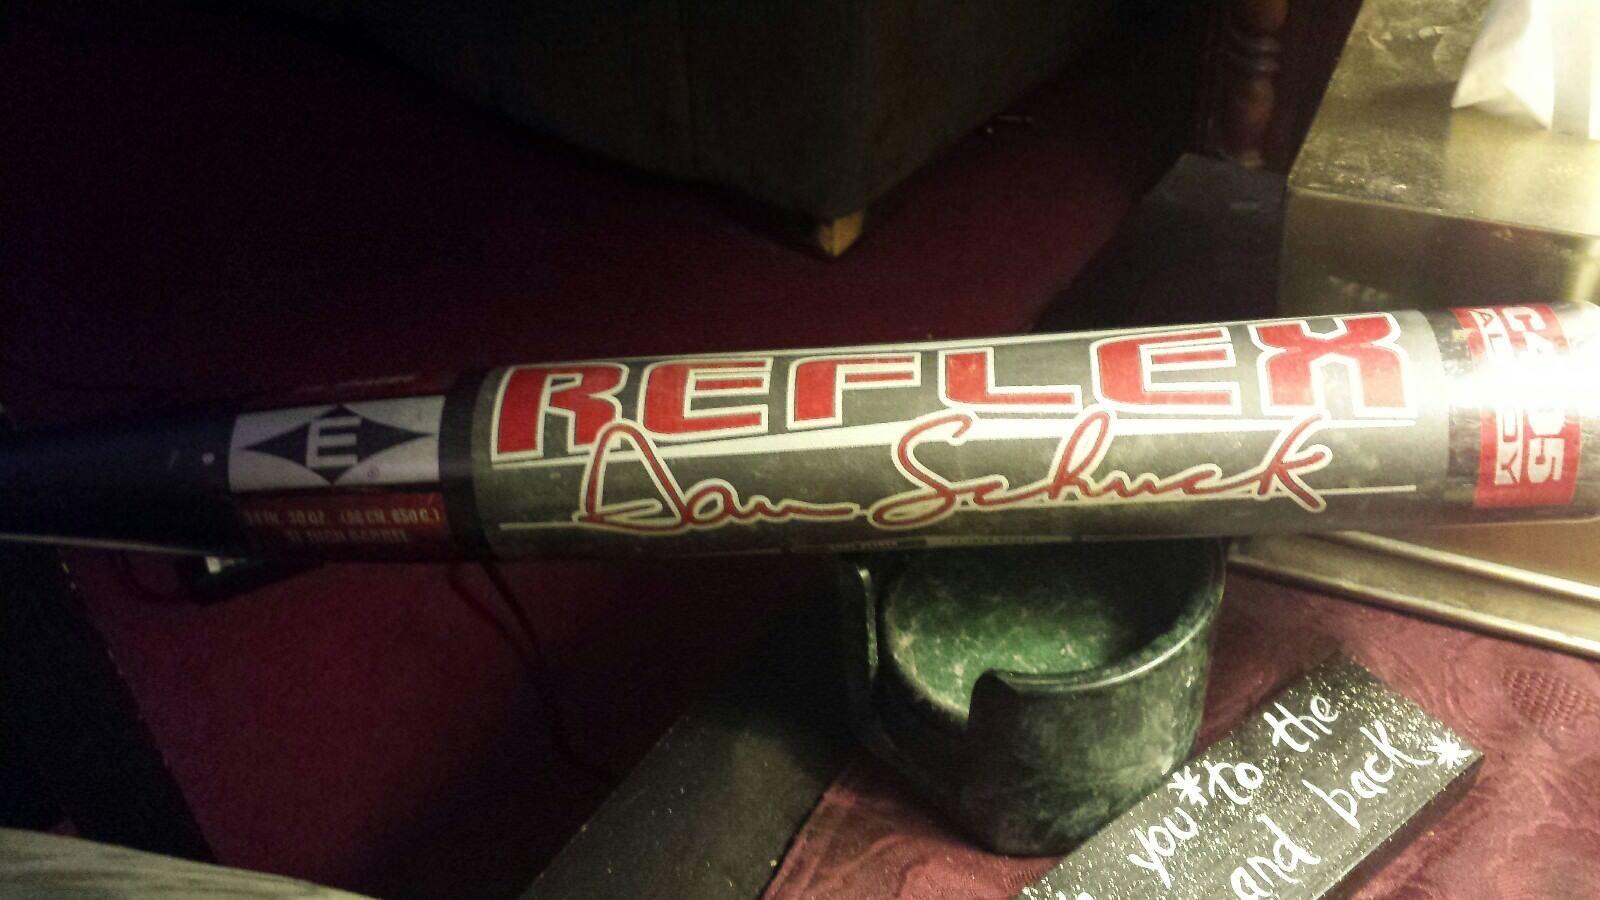 Raro Easton Reflex C405 dan biología SRX9DS 34  30 OZ (approx. 850.47 g). singlewall Softbol bate